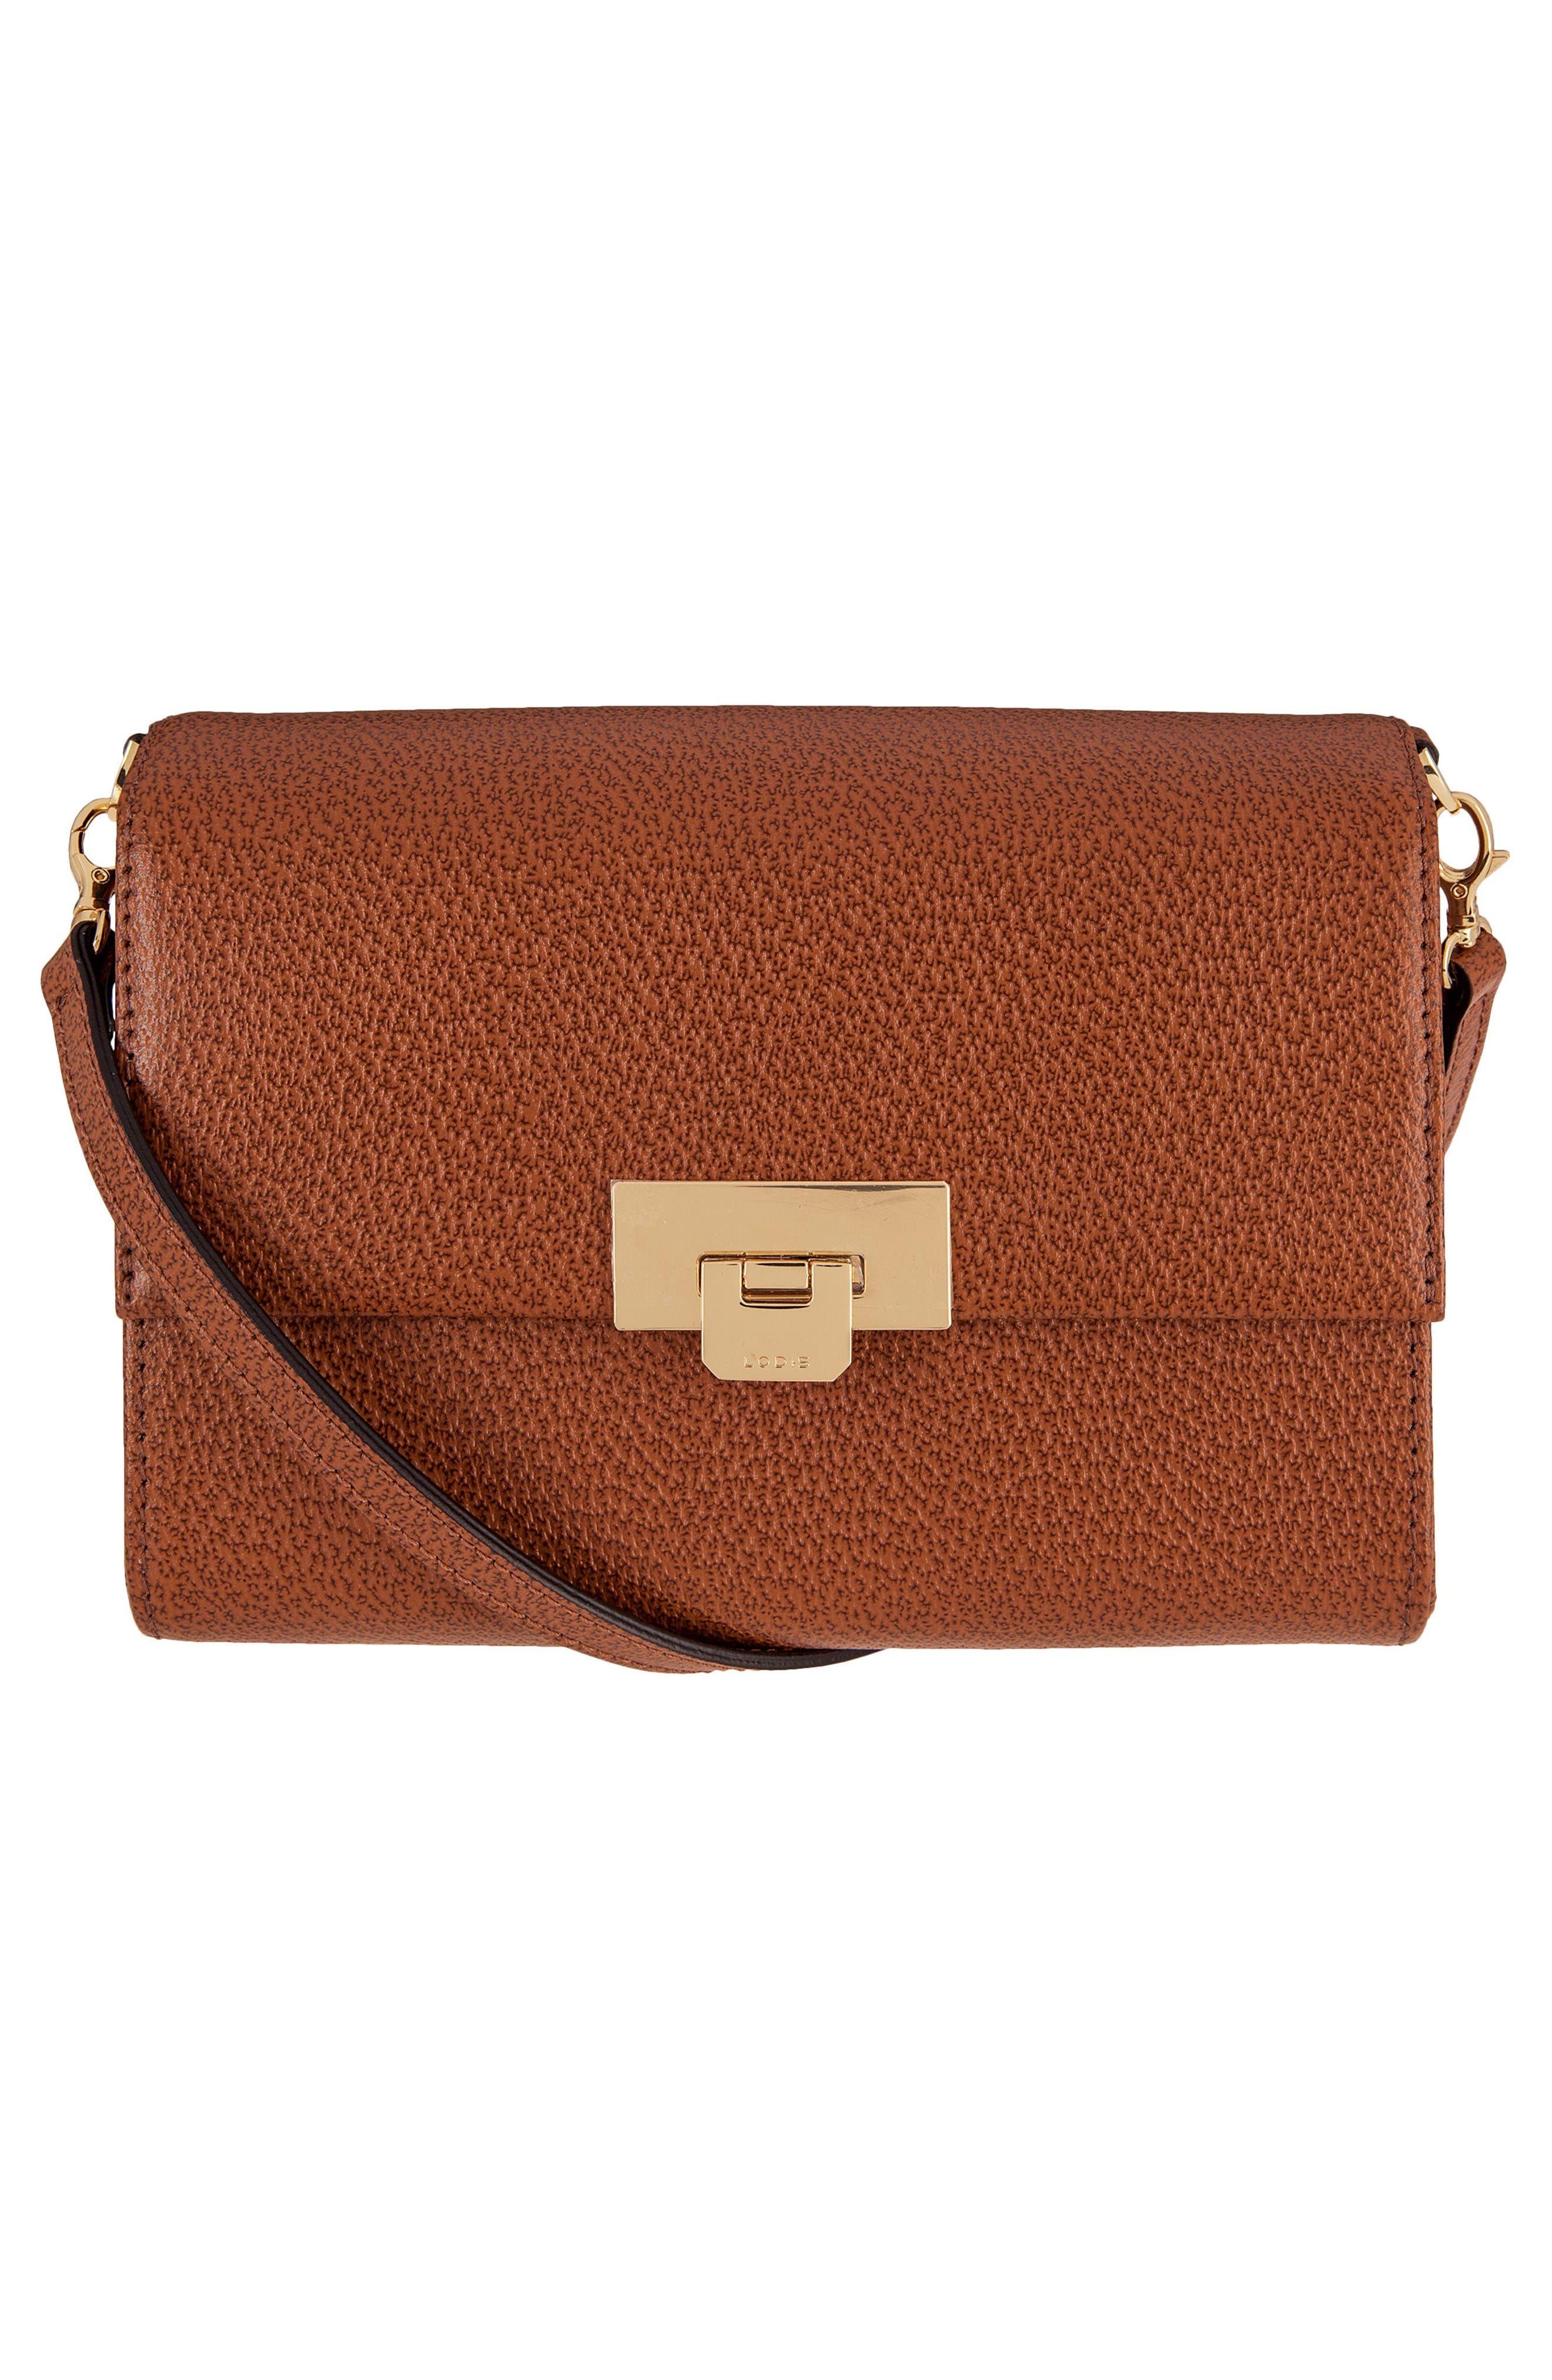 Lodis Small Stephanie Eden Leather Crossbody Bag